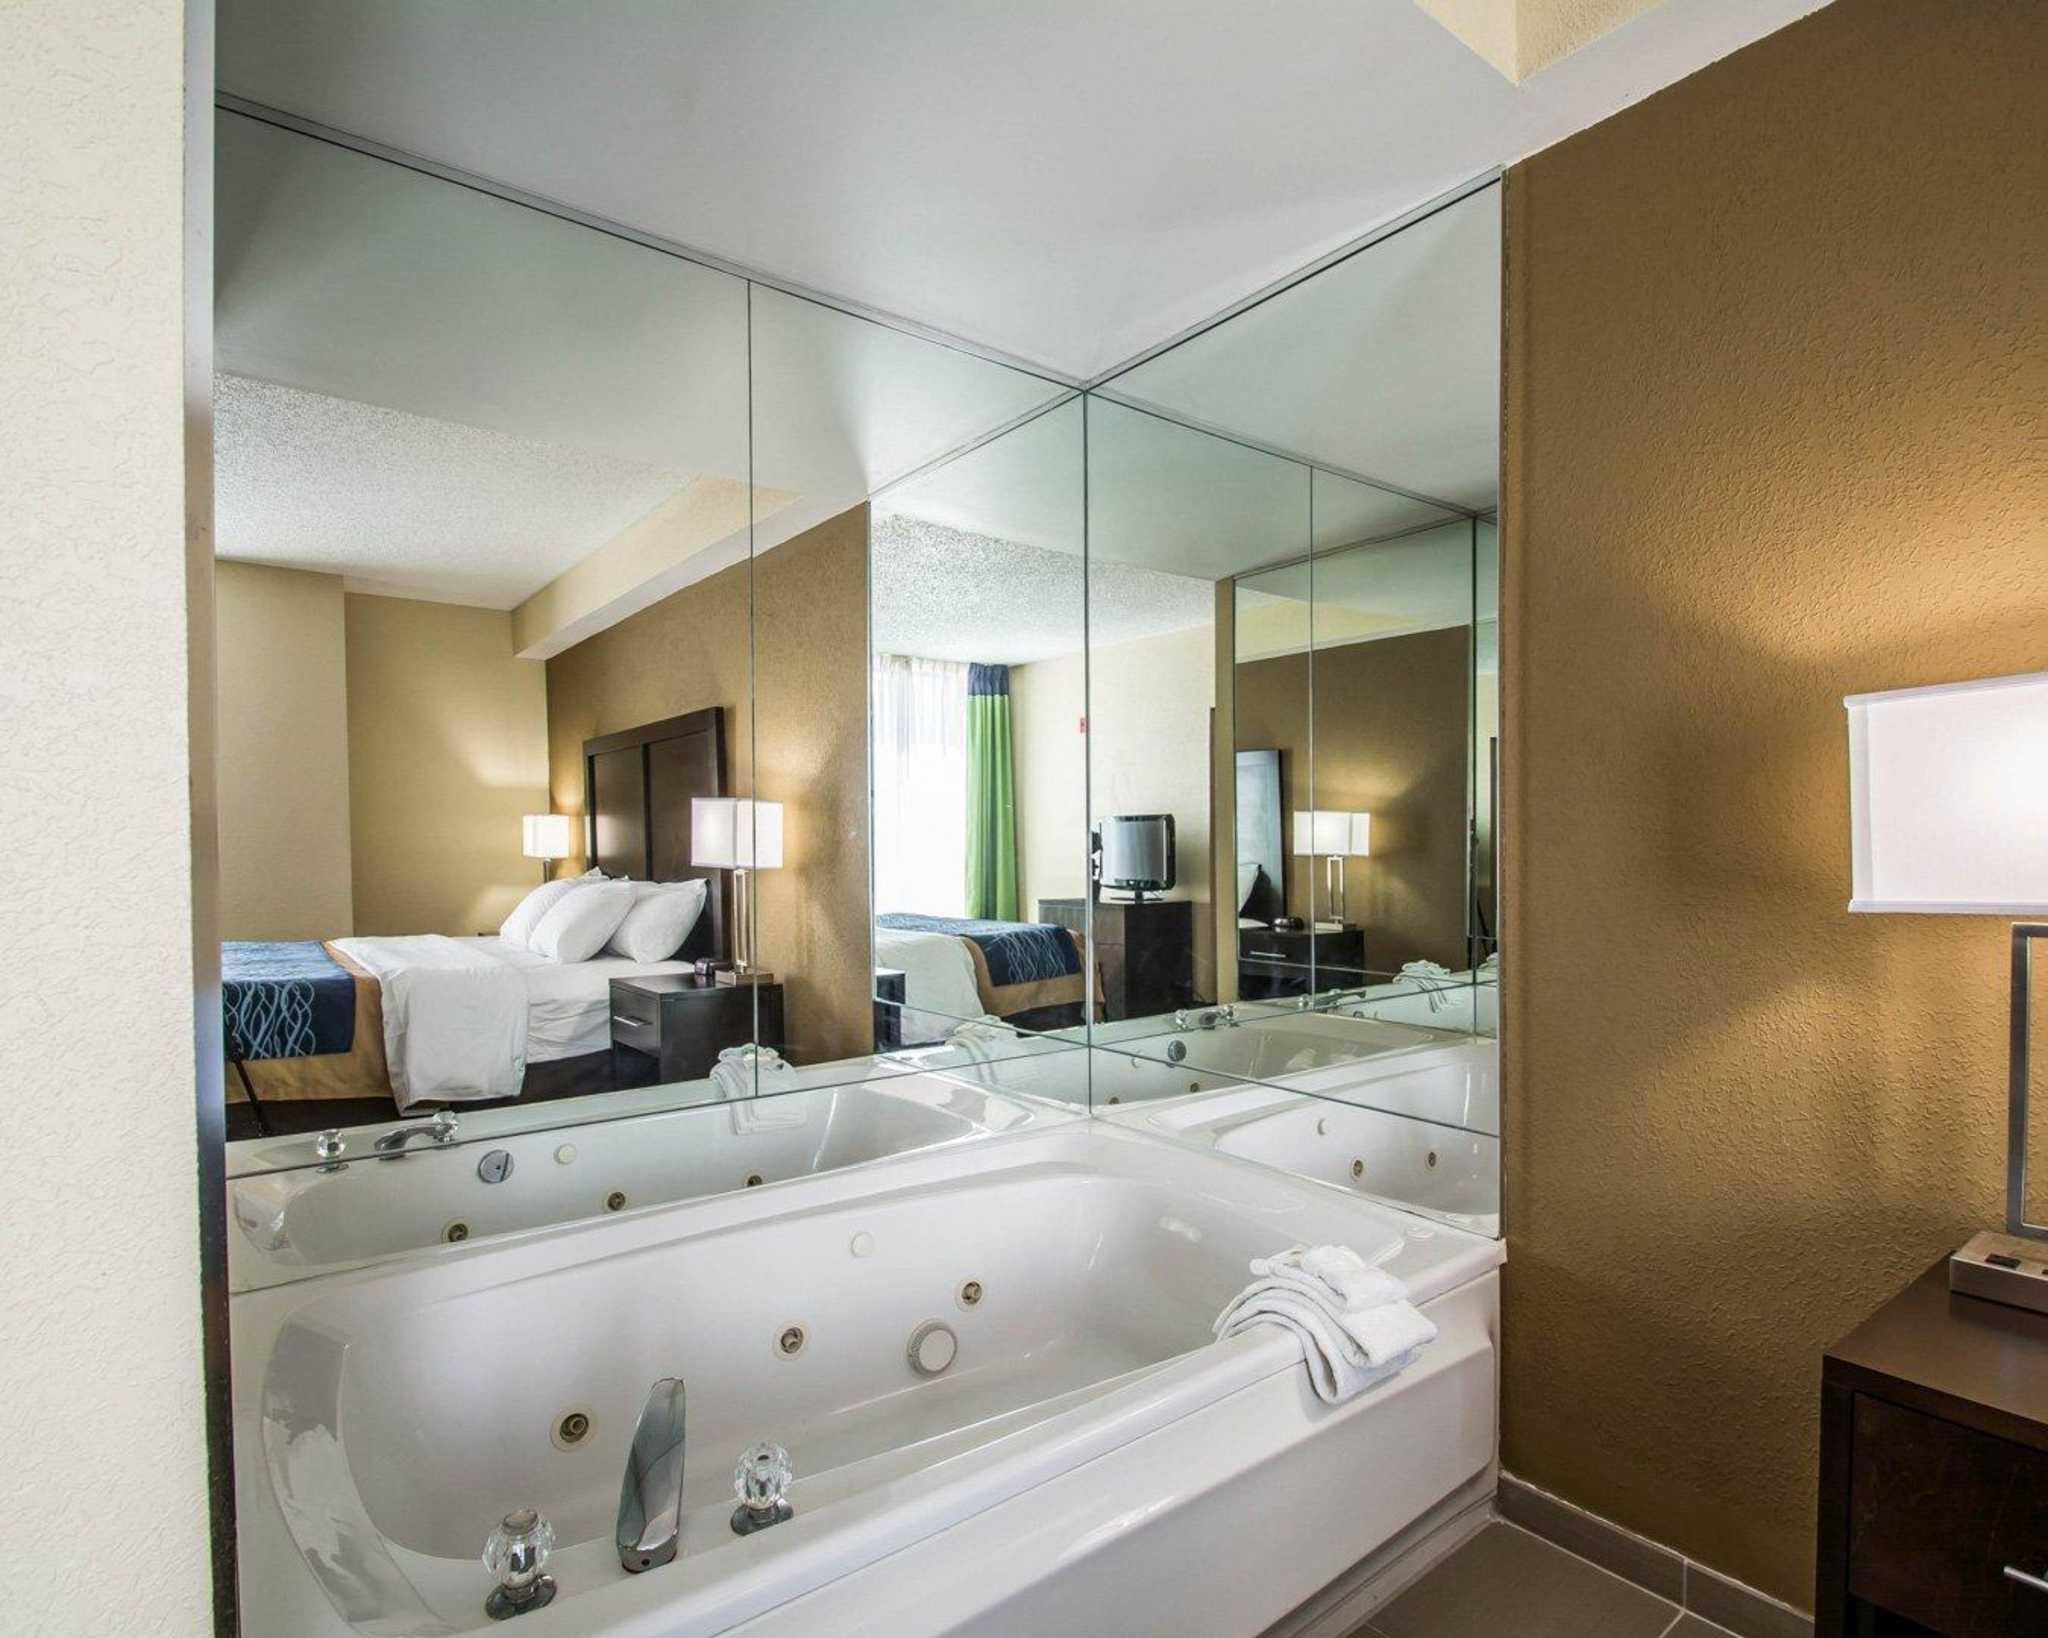 Comfort Inn & Suites Lantana - West Palm Beach South image 21